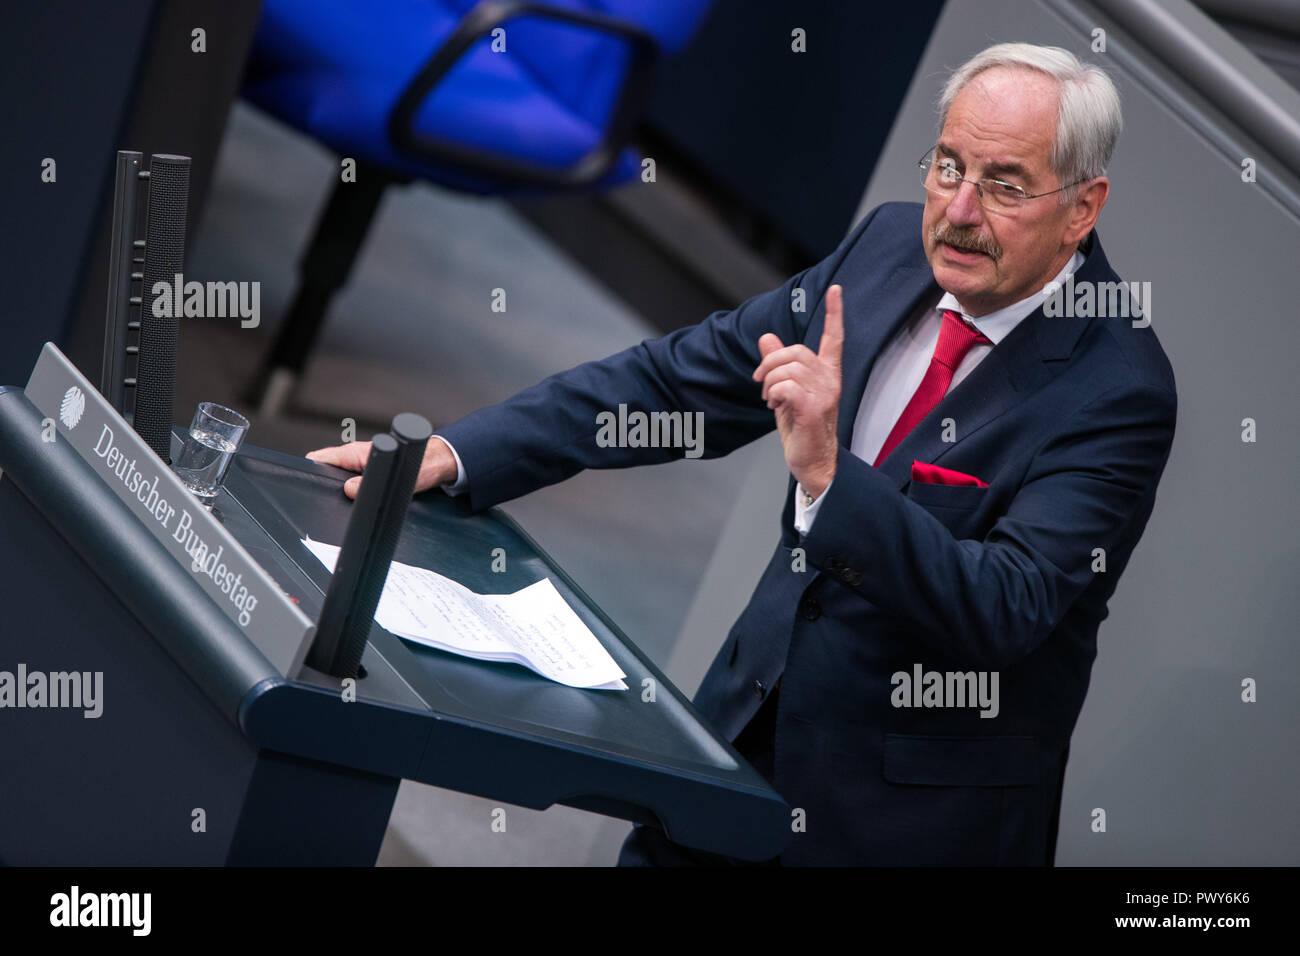 Berlin, Germany. 18th Oct, 2018. Hans-Jürgen Irmer, member of the Bundestag of the CDU/CSU parliamentary group, speaks in the Bundestag. Credit: Jens Büttner/dpa-Zentralbild/dpa/Alamy Live News - Stock Image